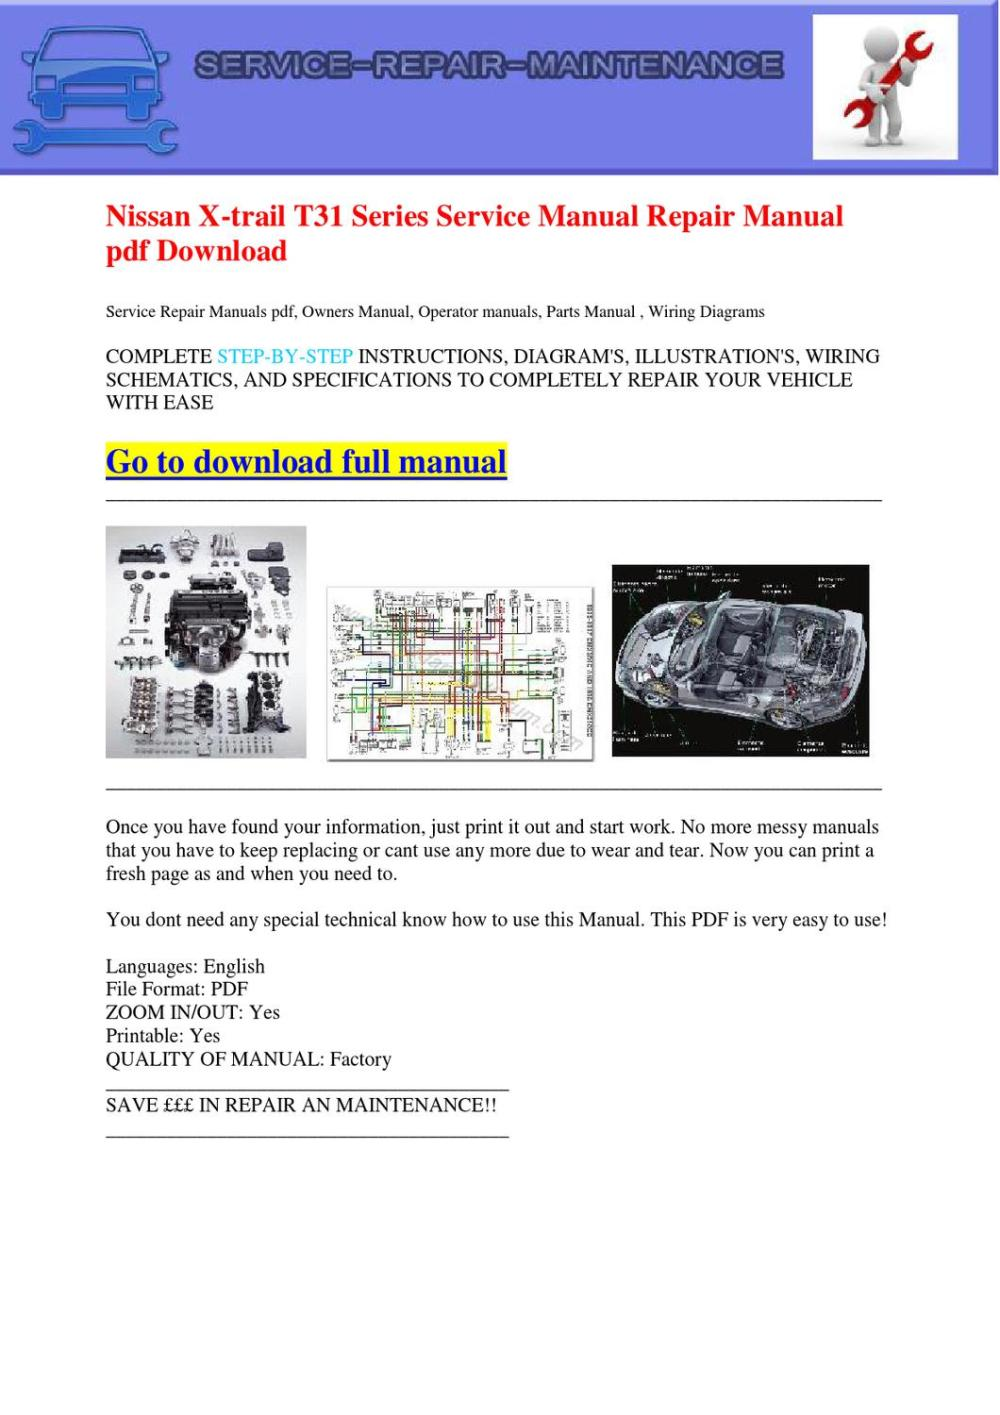 medium resolution of nissan x trail t31 series service manual repair manual pdf download by dernis castan issuu